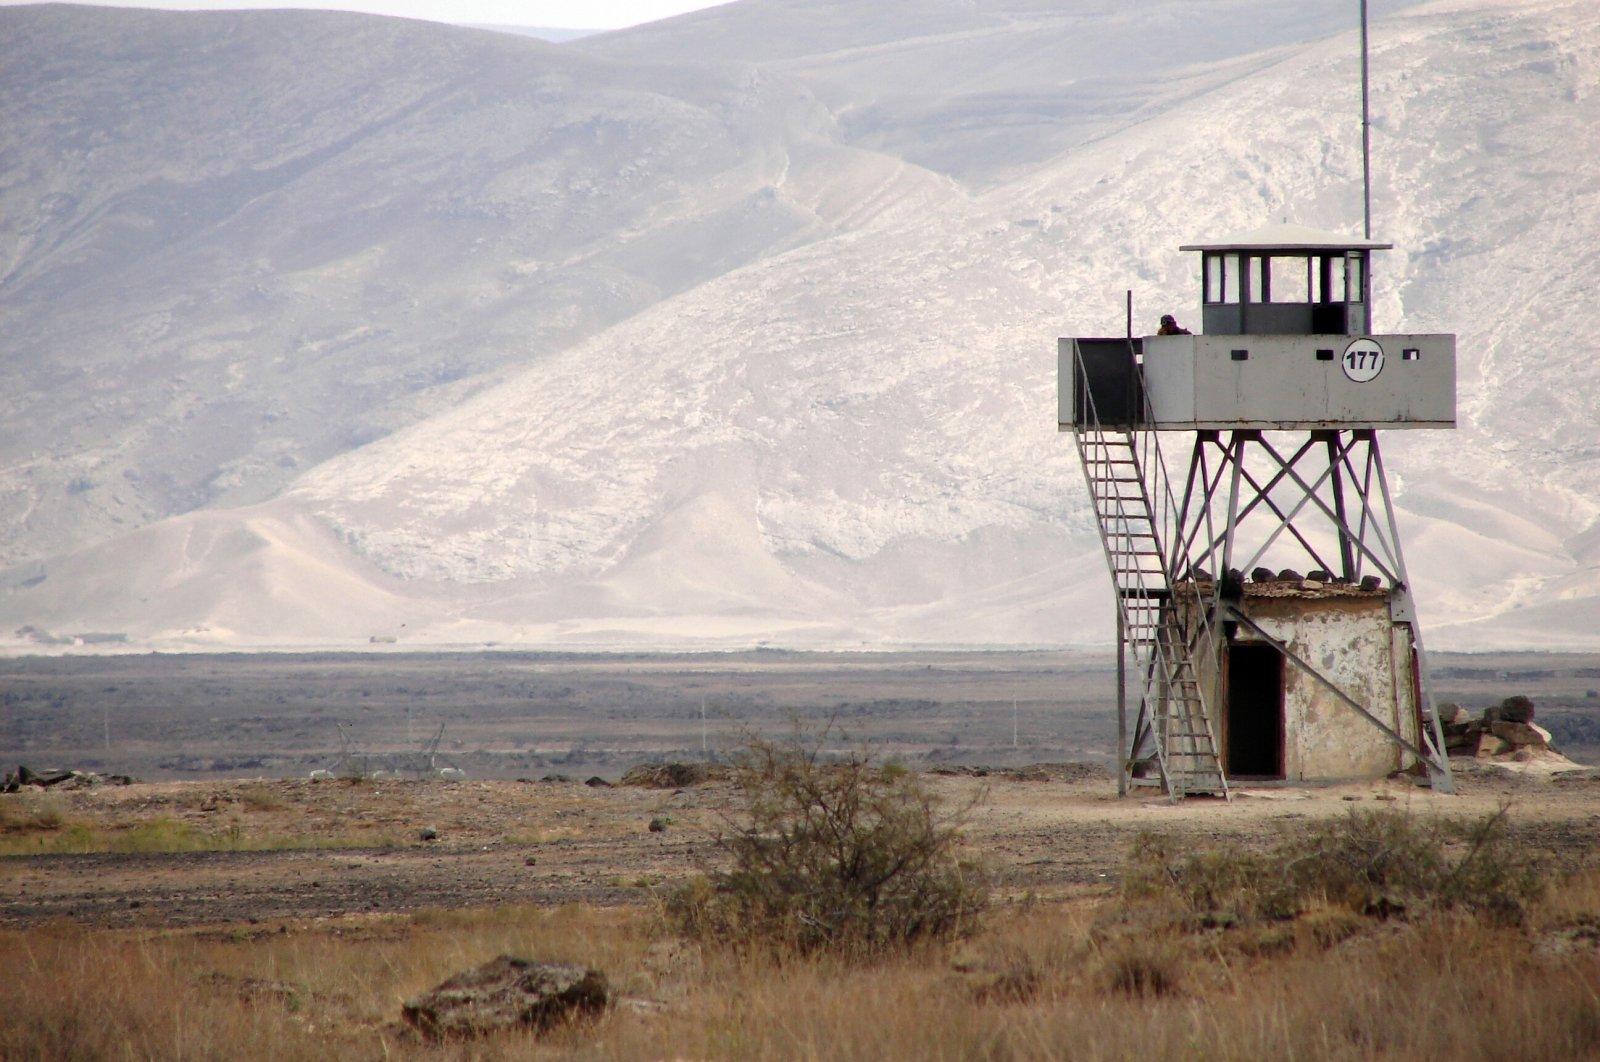 Watchtower near the Iranian border in eastern Turkey. (Shutterstock File Photo)